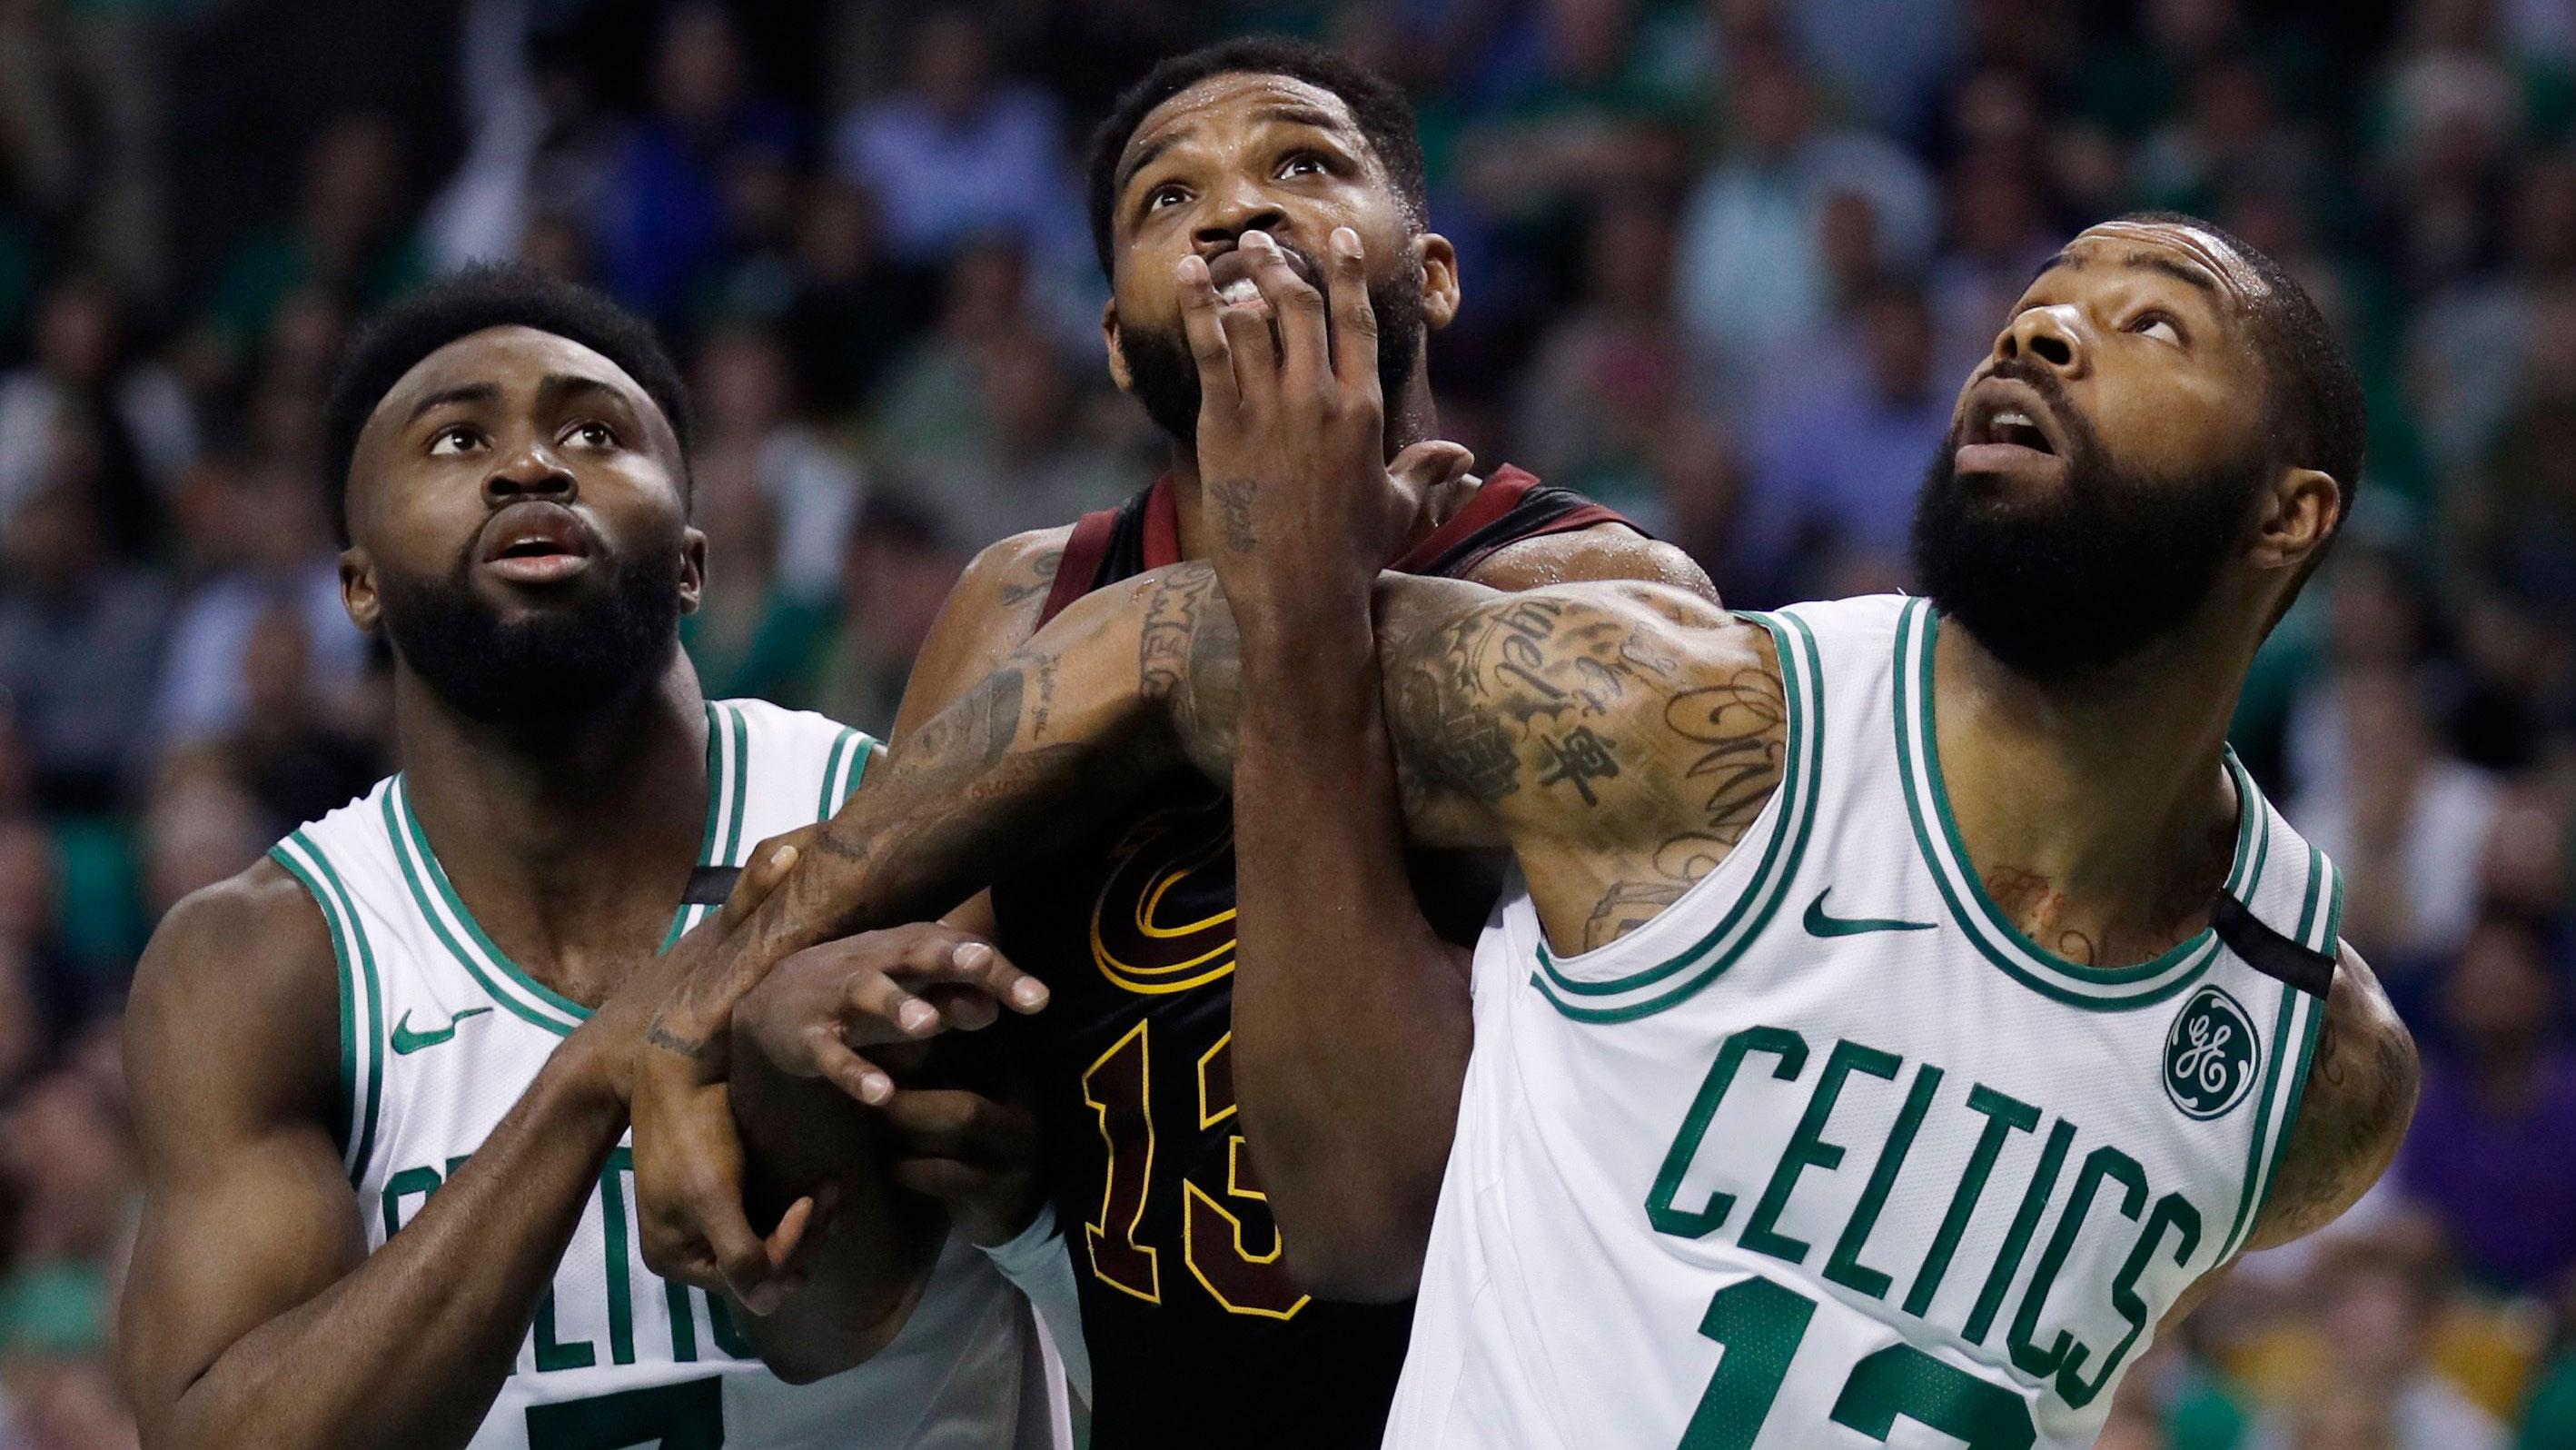 Celticscavs